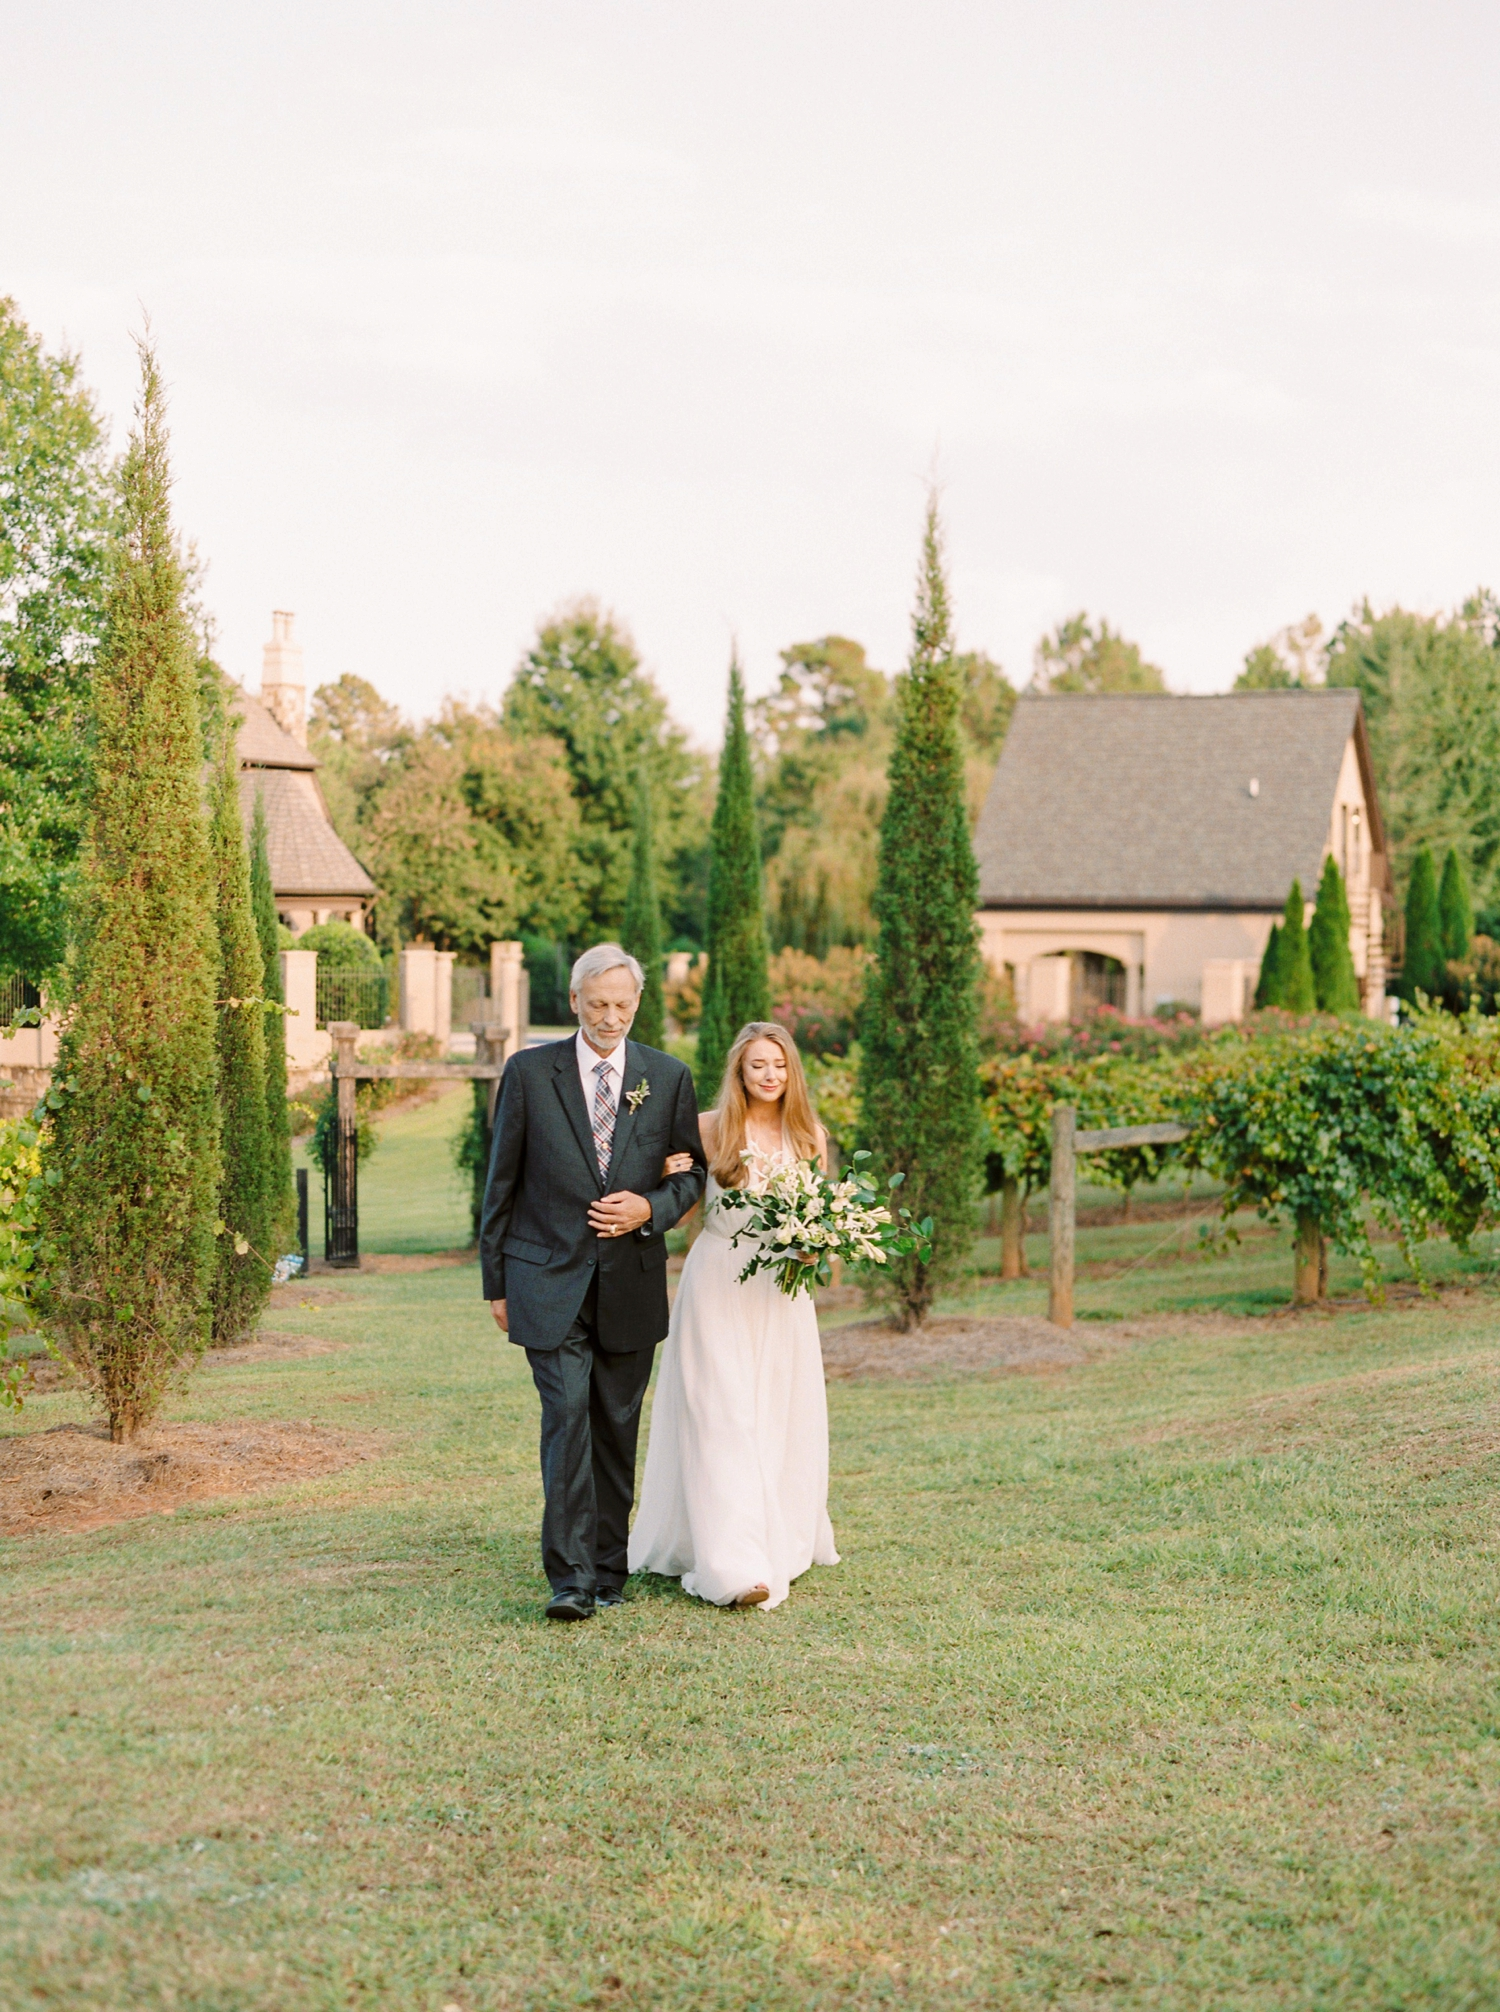 Calgary wedding photographers | georgia wedding photographers | fine art film | Justine Milton Photography | georgia wedding | bride and groom portraits | walking down the aisle | father and bride